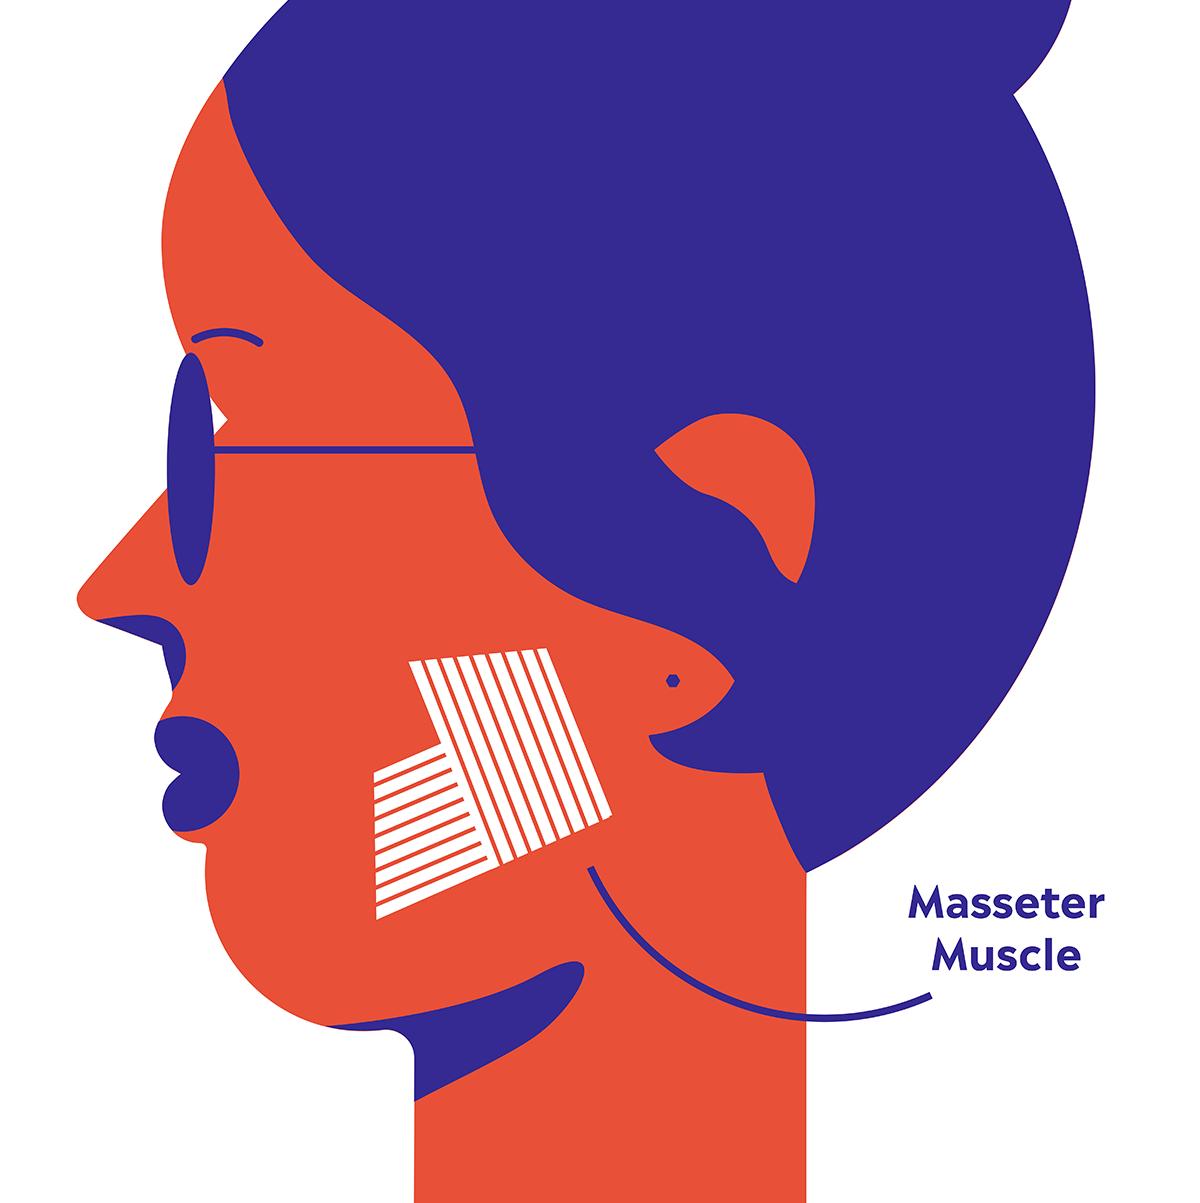 [Image: masseter-diagram-1541533899.png?crop=1.0...size=480:*]